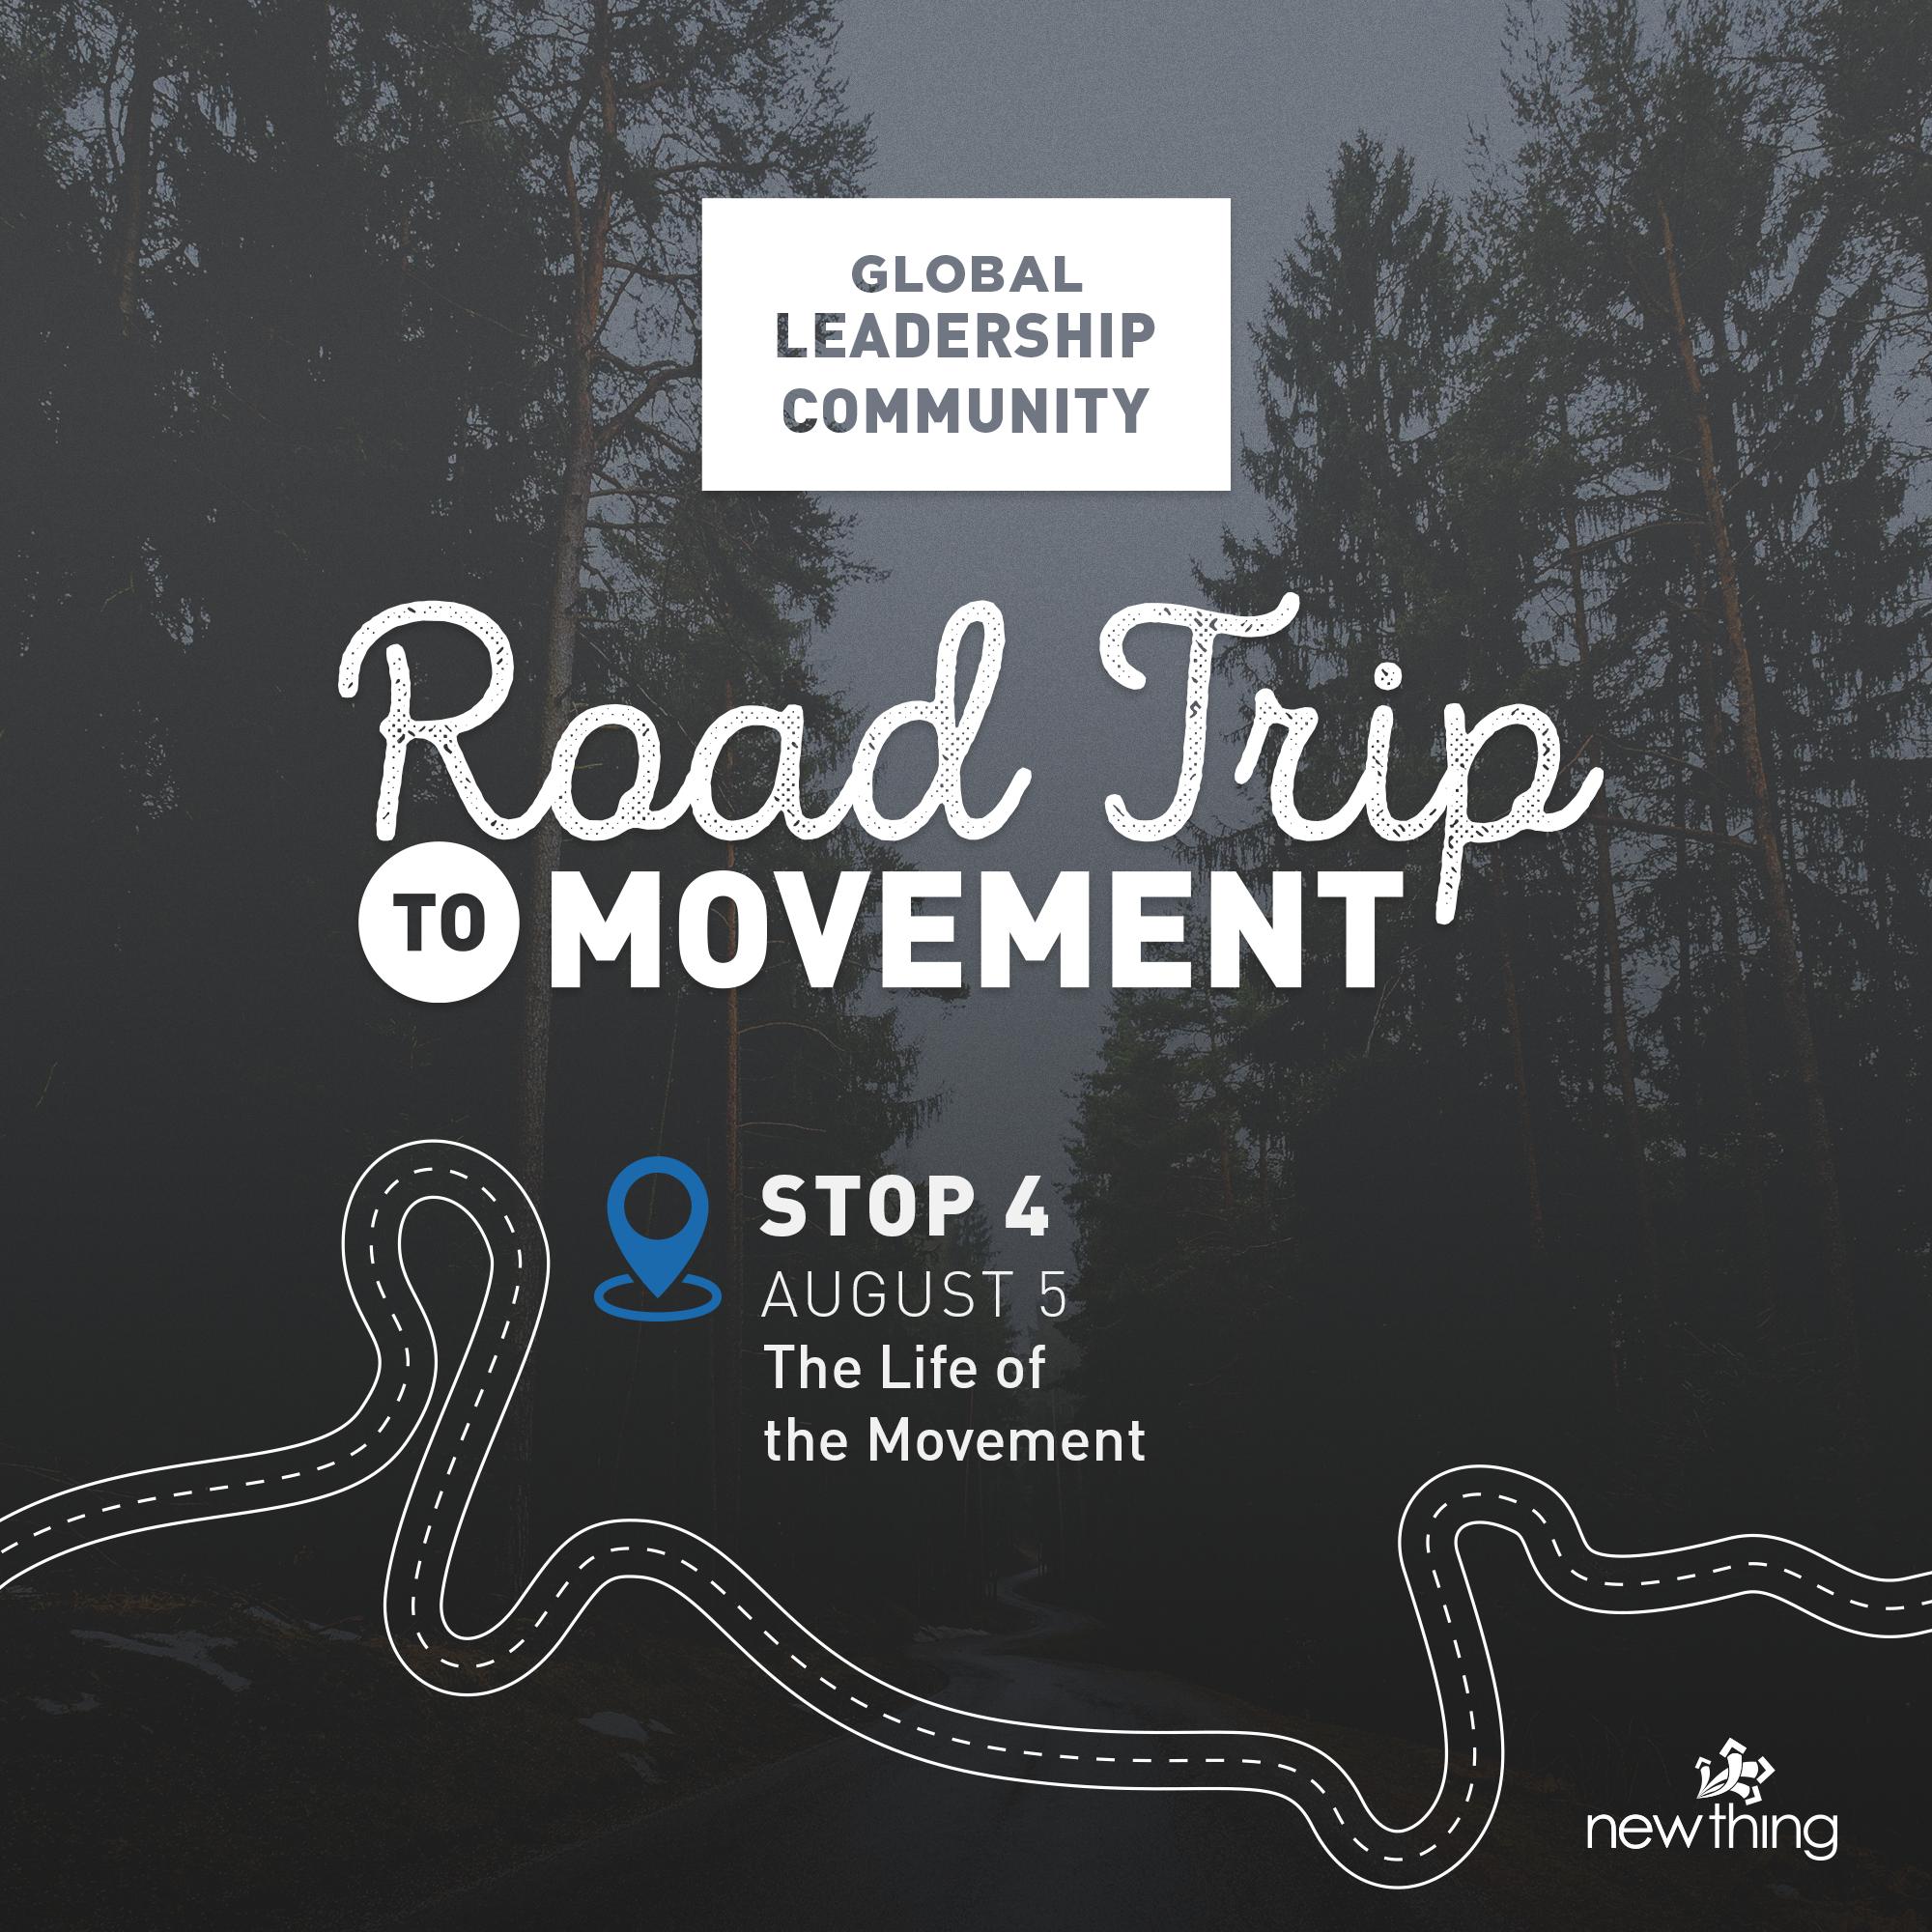 Global Leadership Community